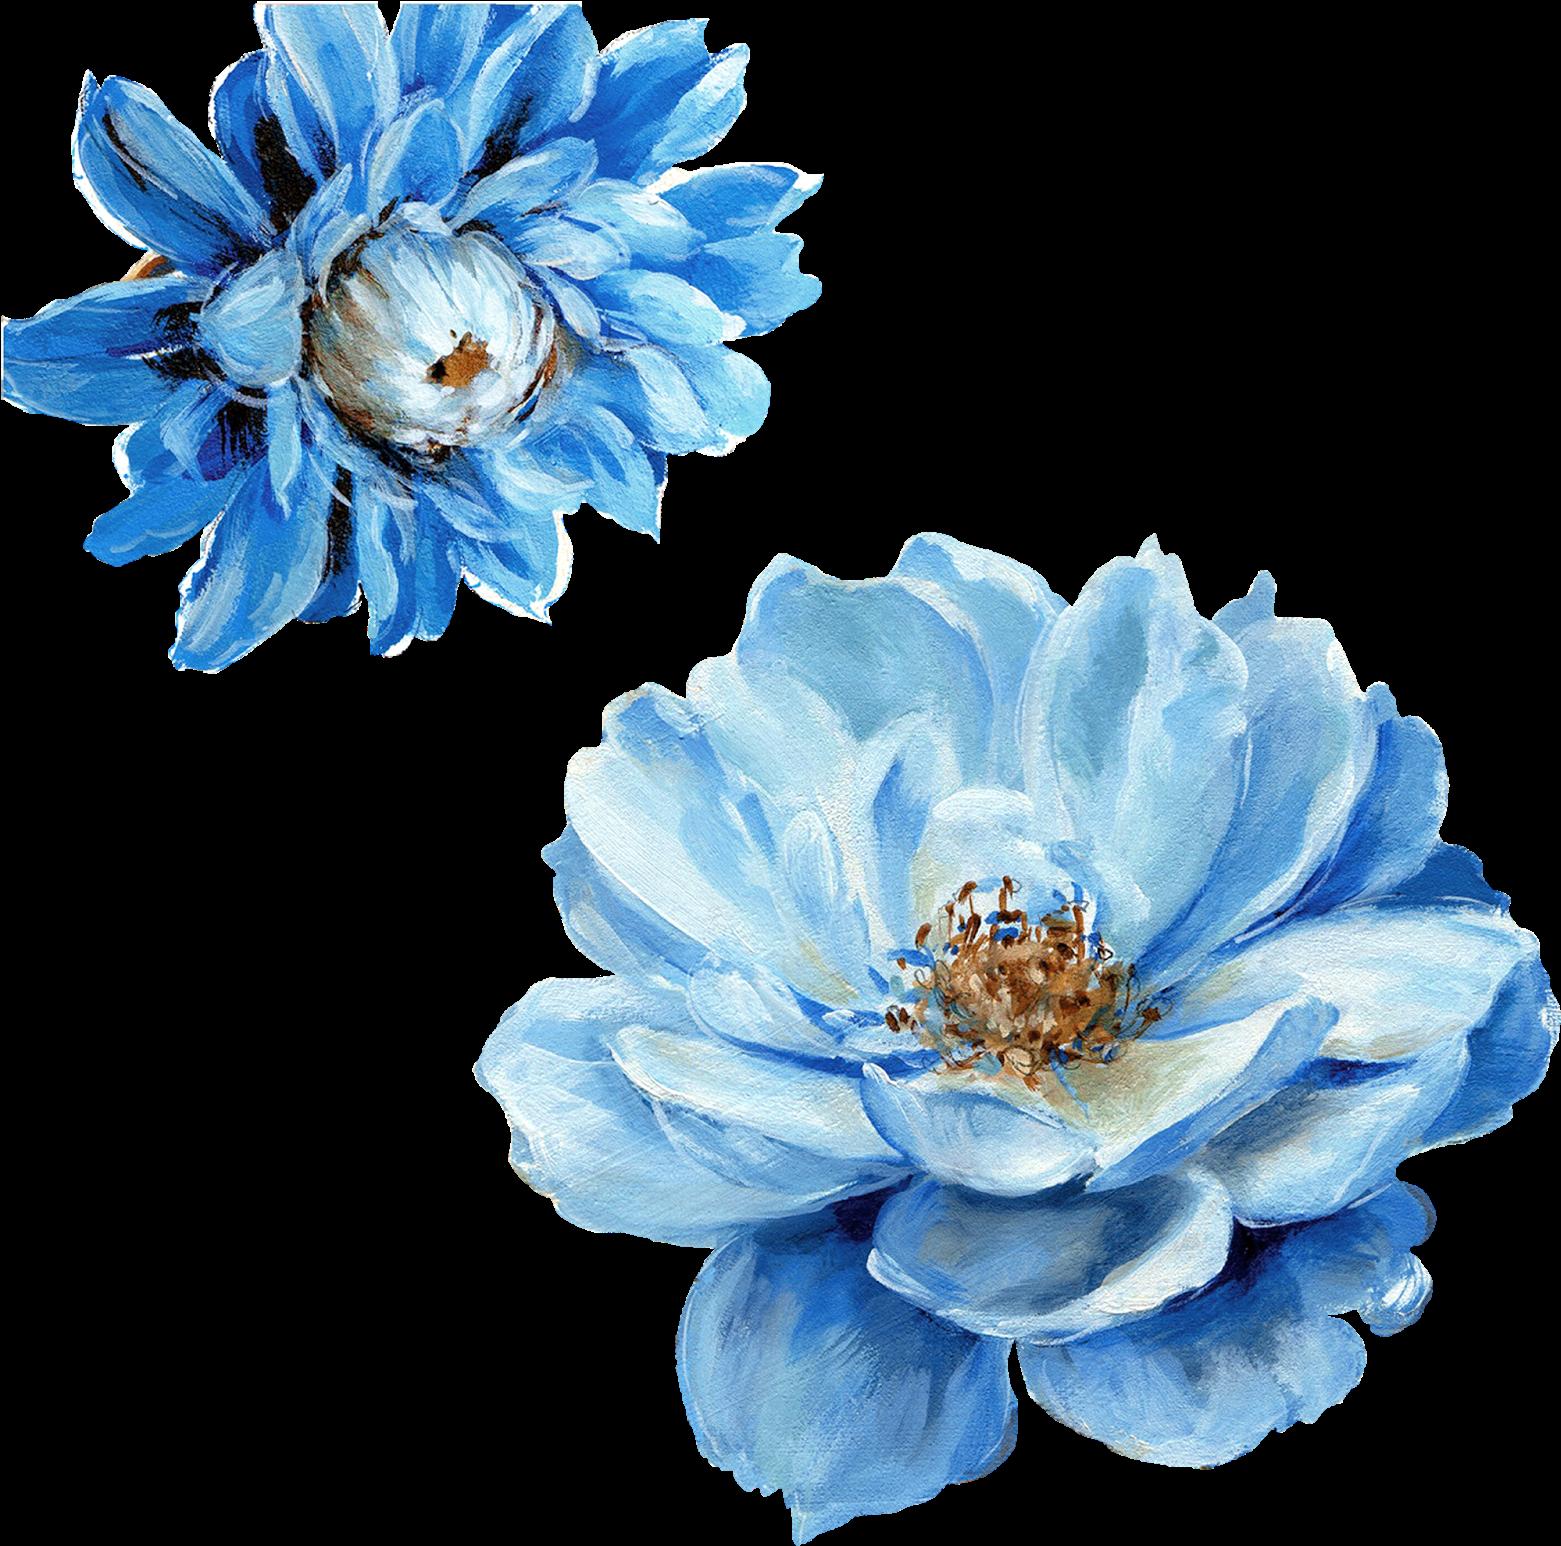 Png Blue Flowers Blue Watercolour Flowers Png